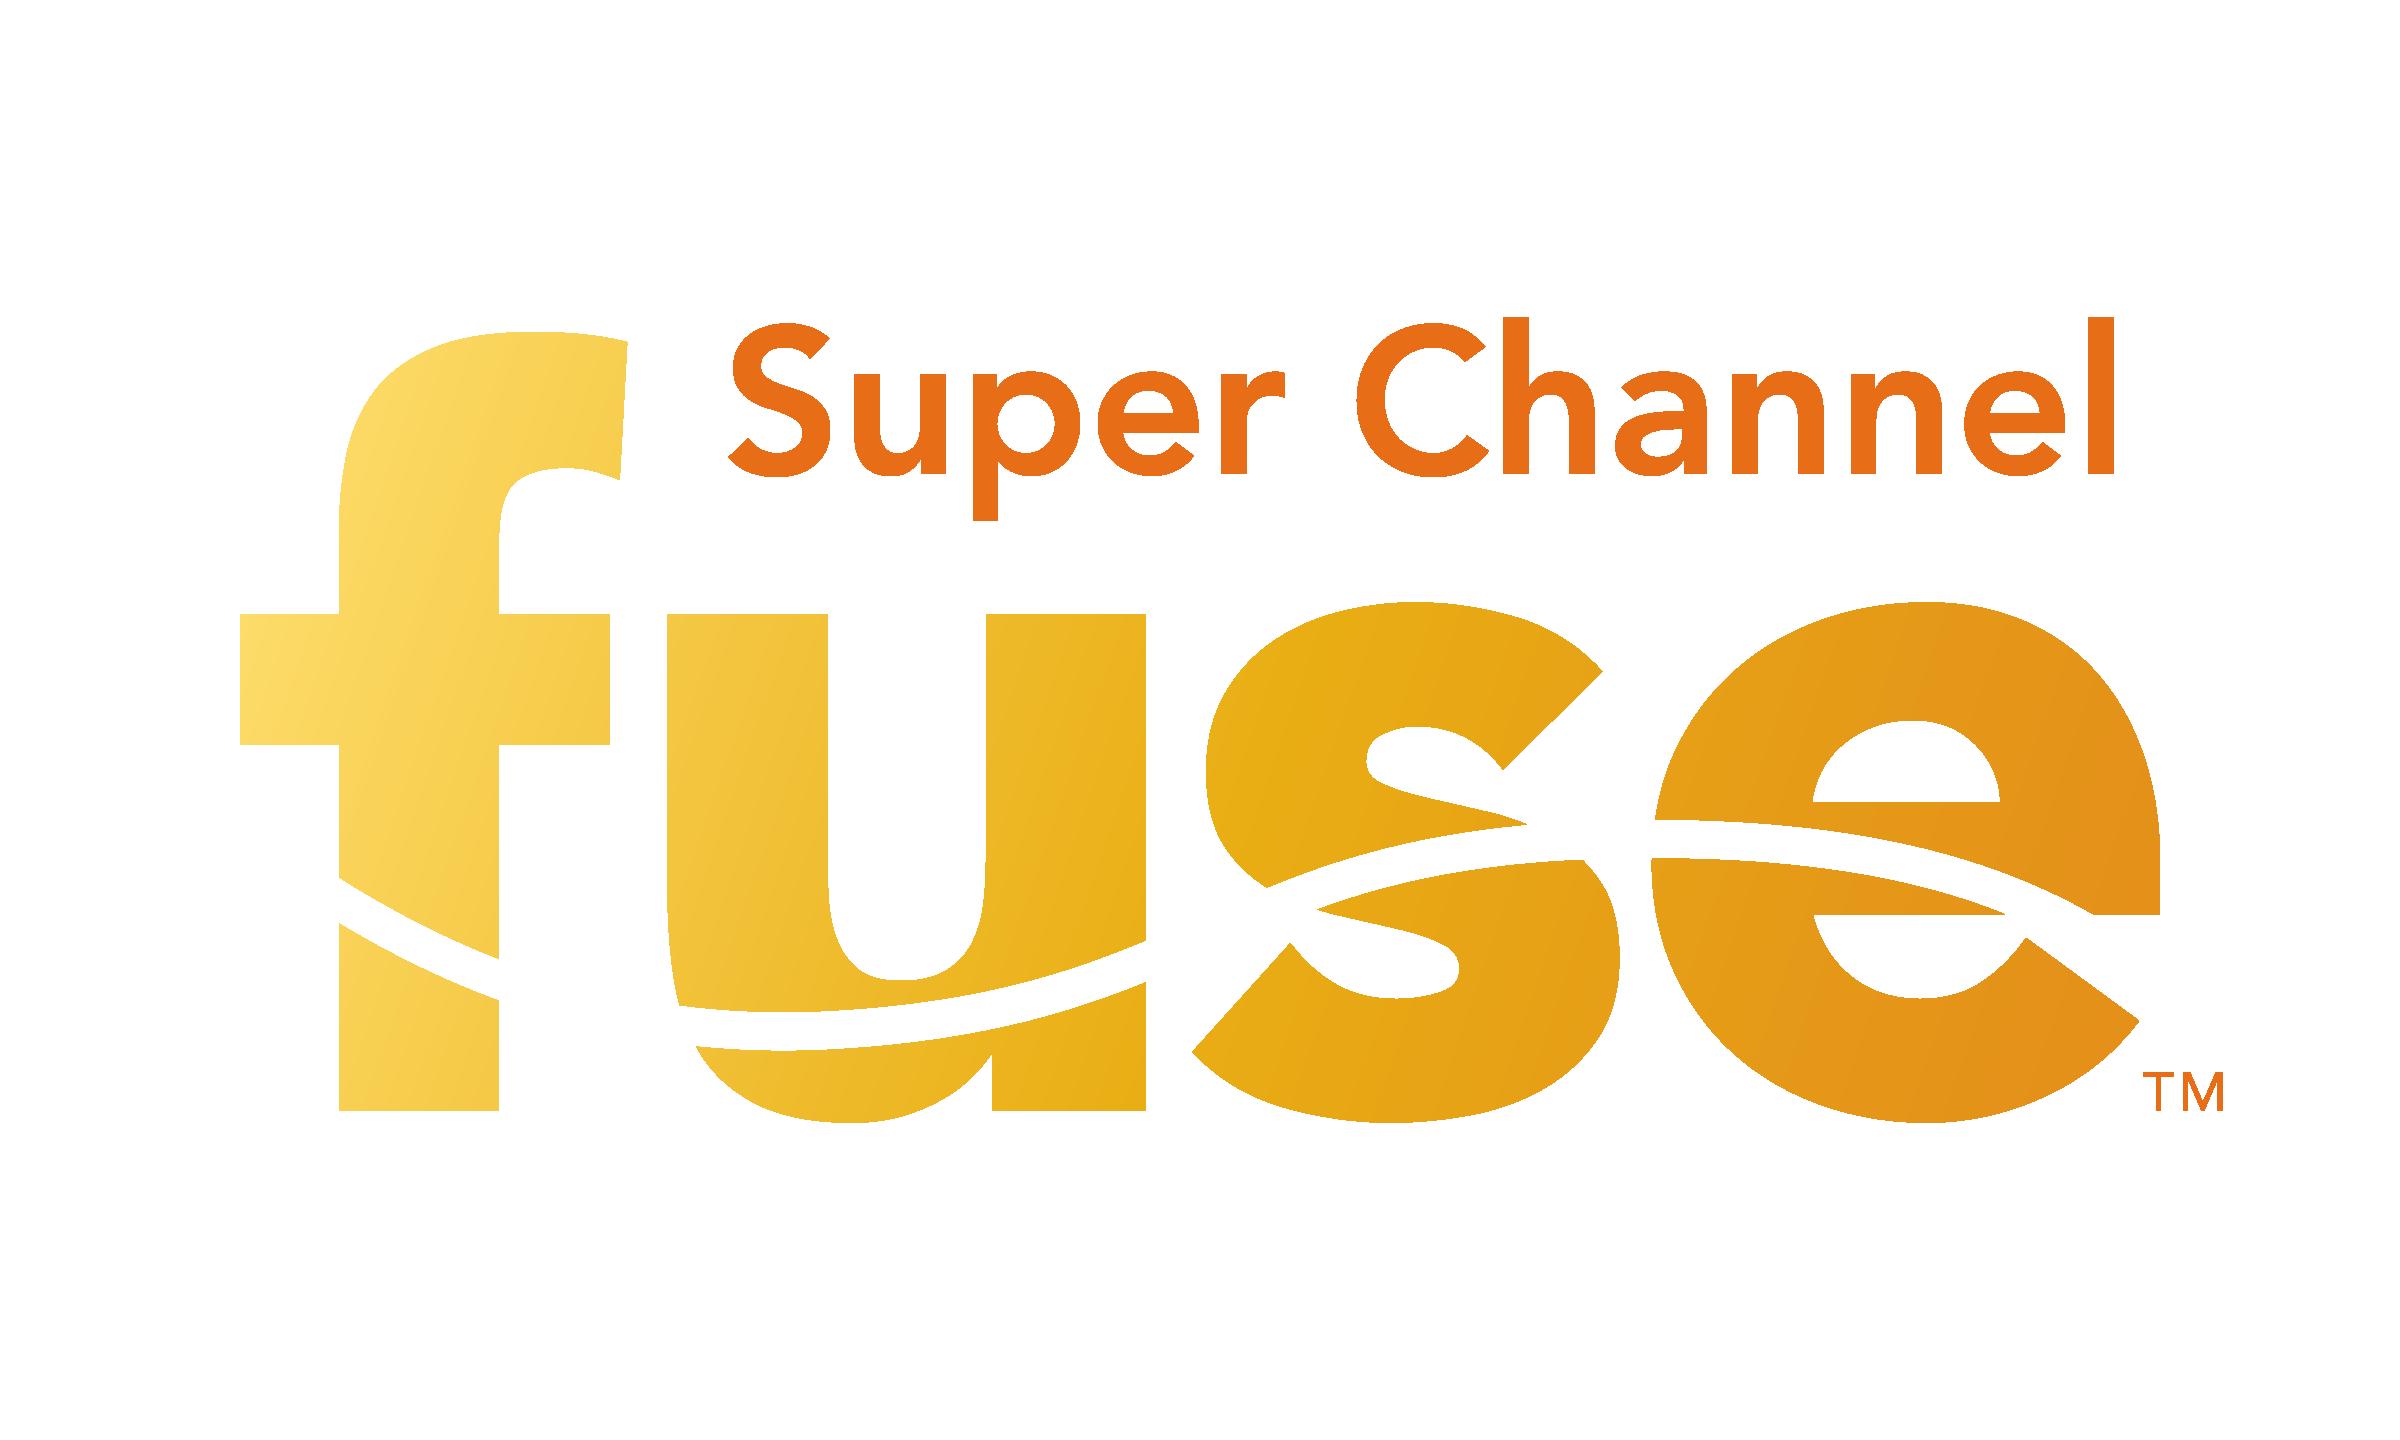 Super Channel Fuse